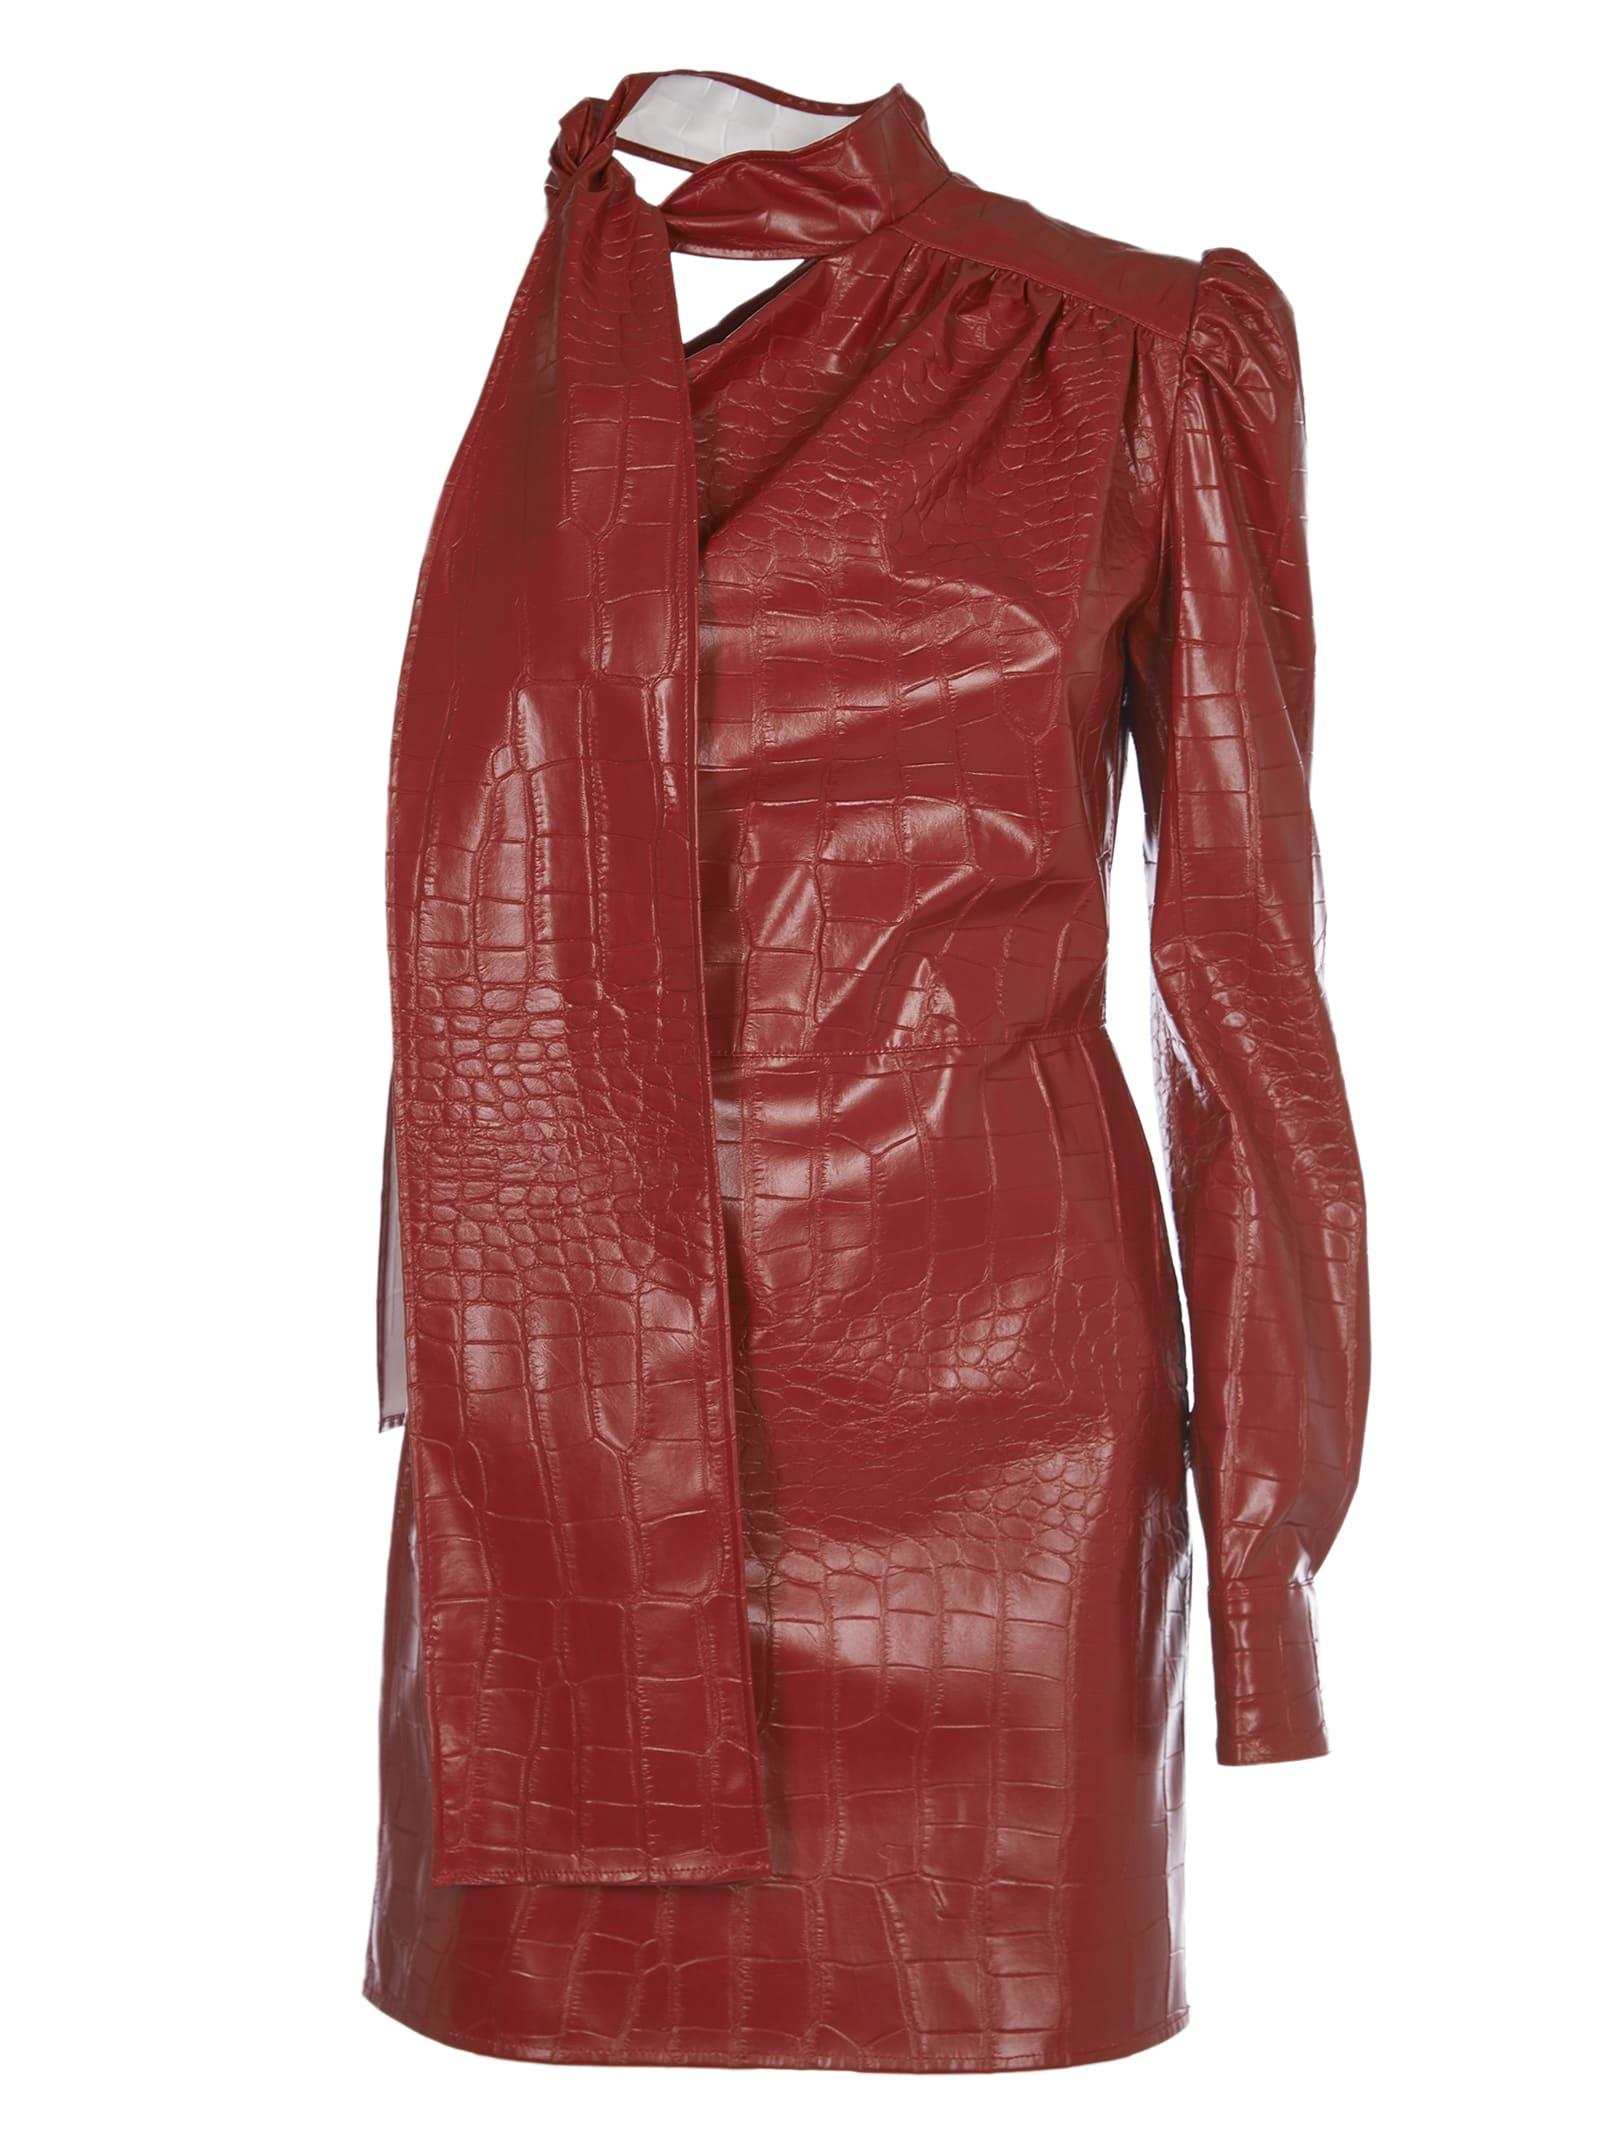 MSGM Red Crocodile Print Dress